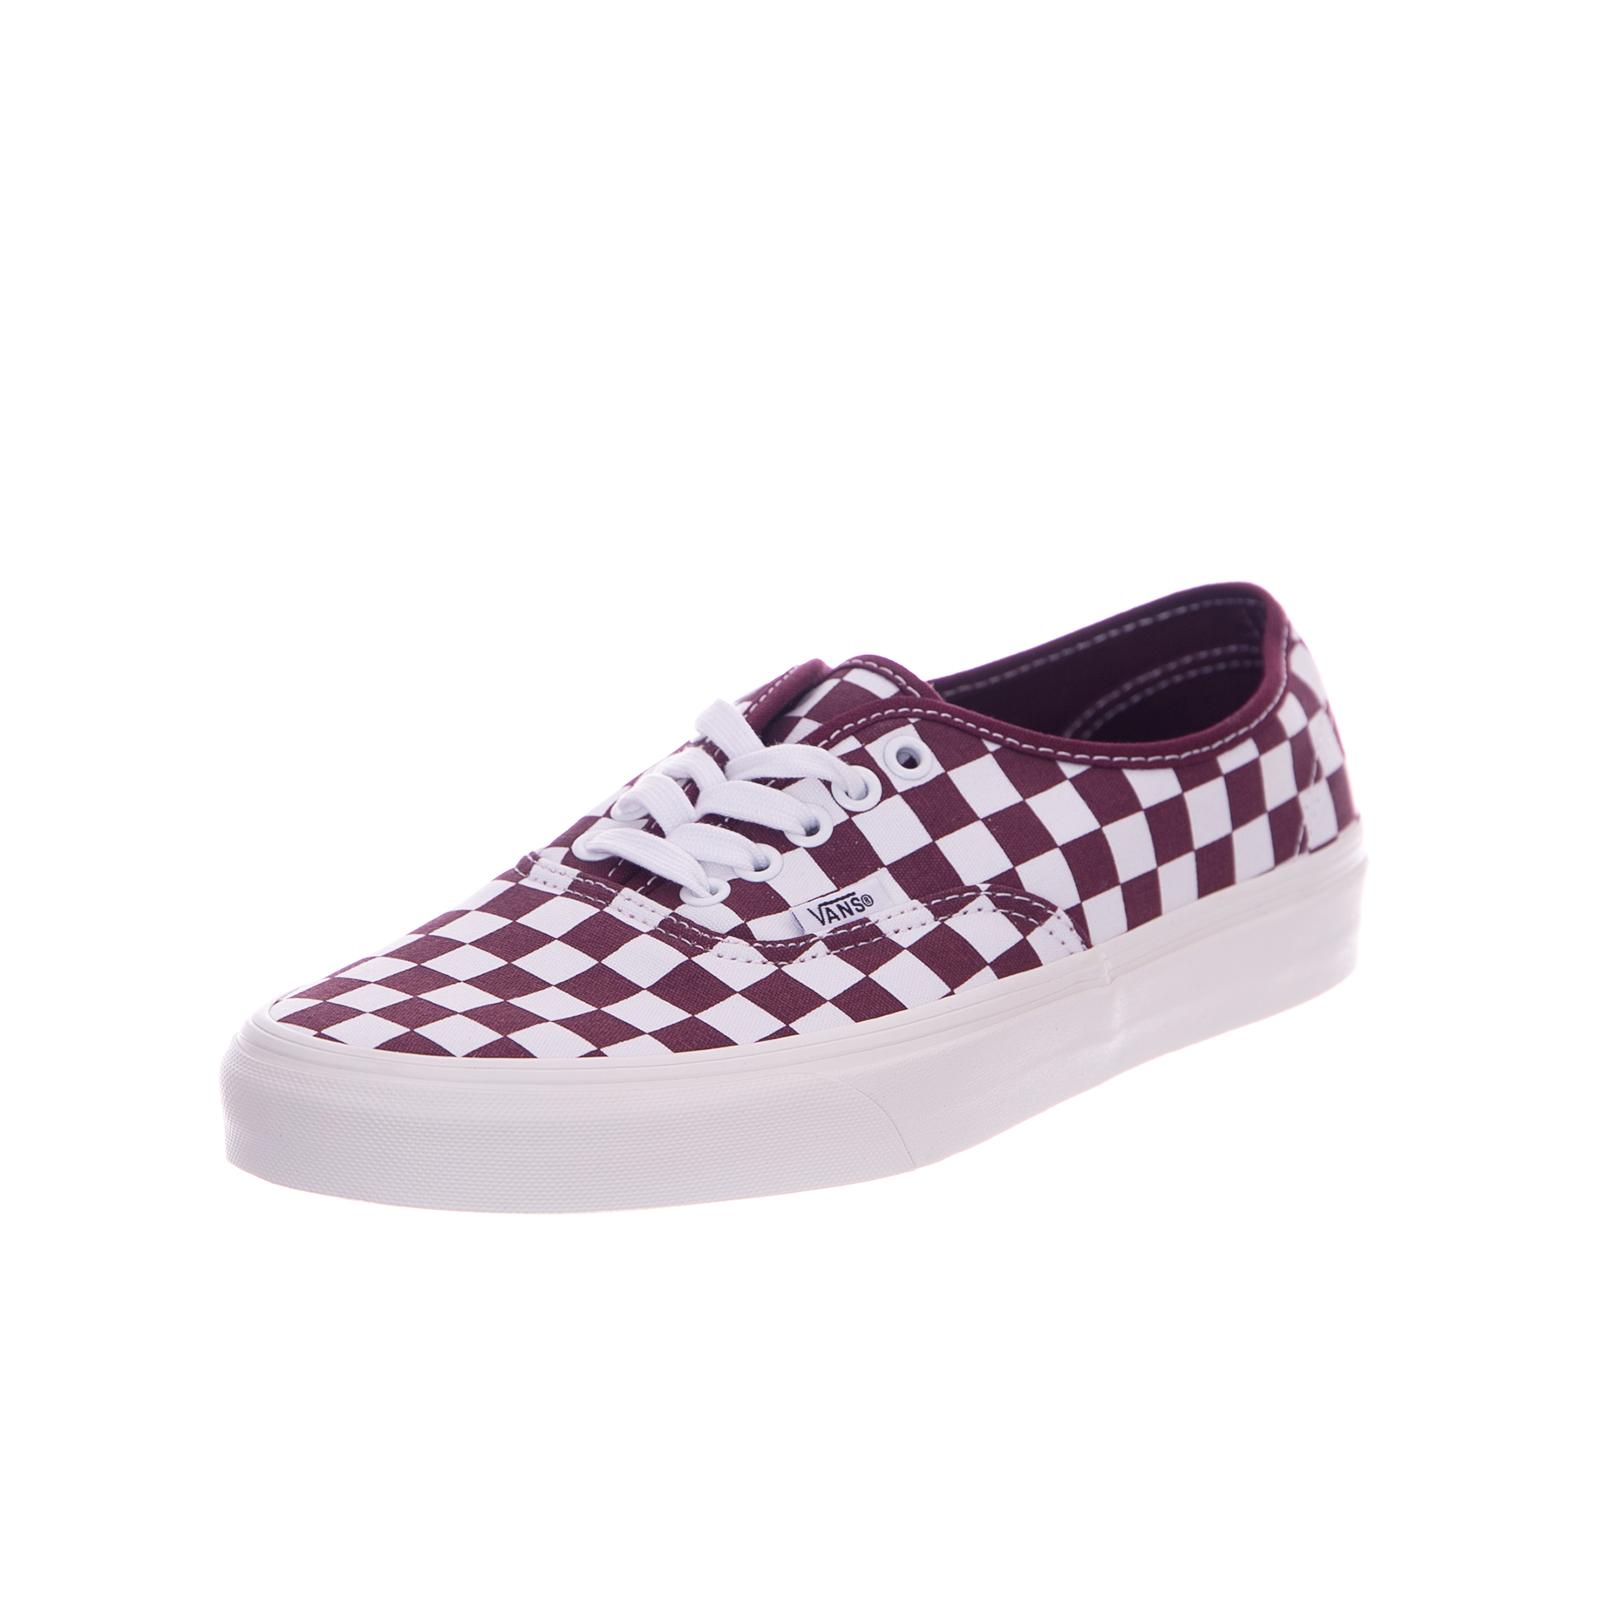 4725c1282a049 Vans Sneakers U Authentic Checkerboard Port Royale Marshmallow Bordeaux